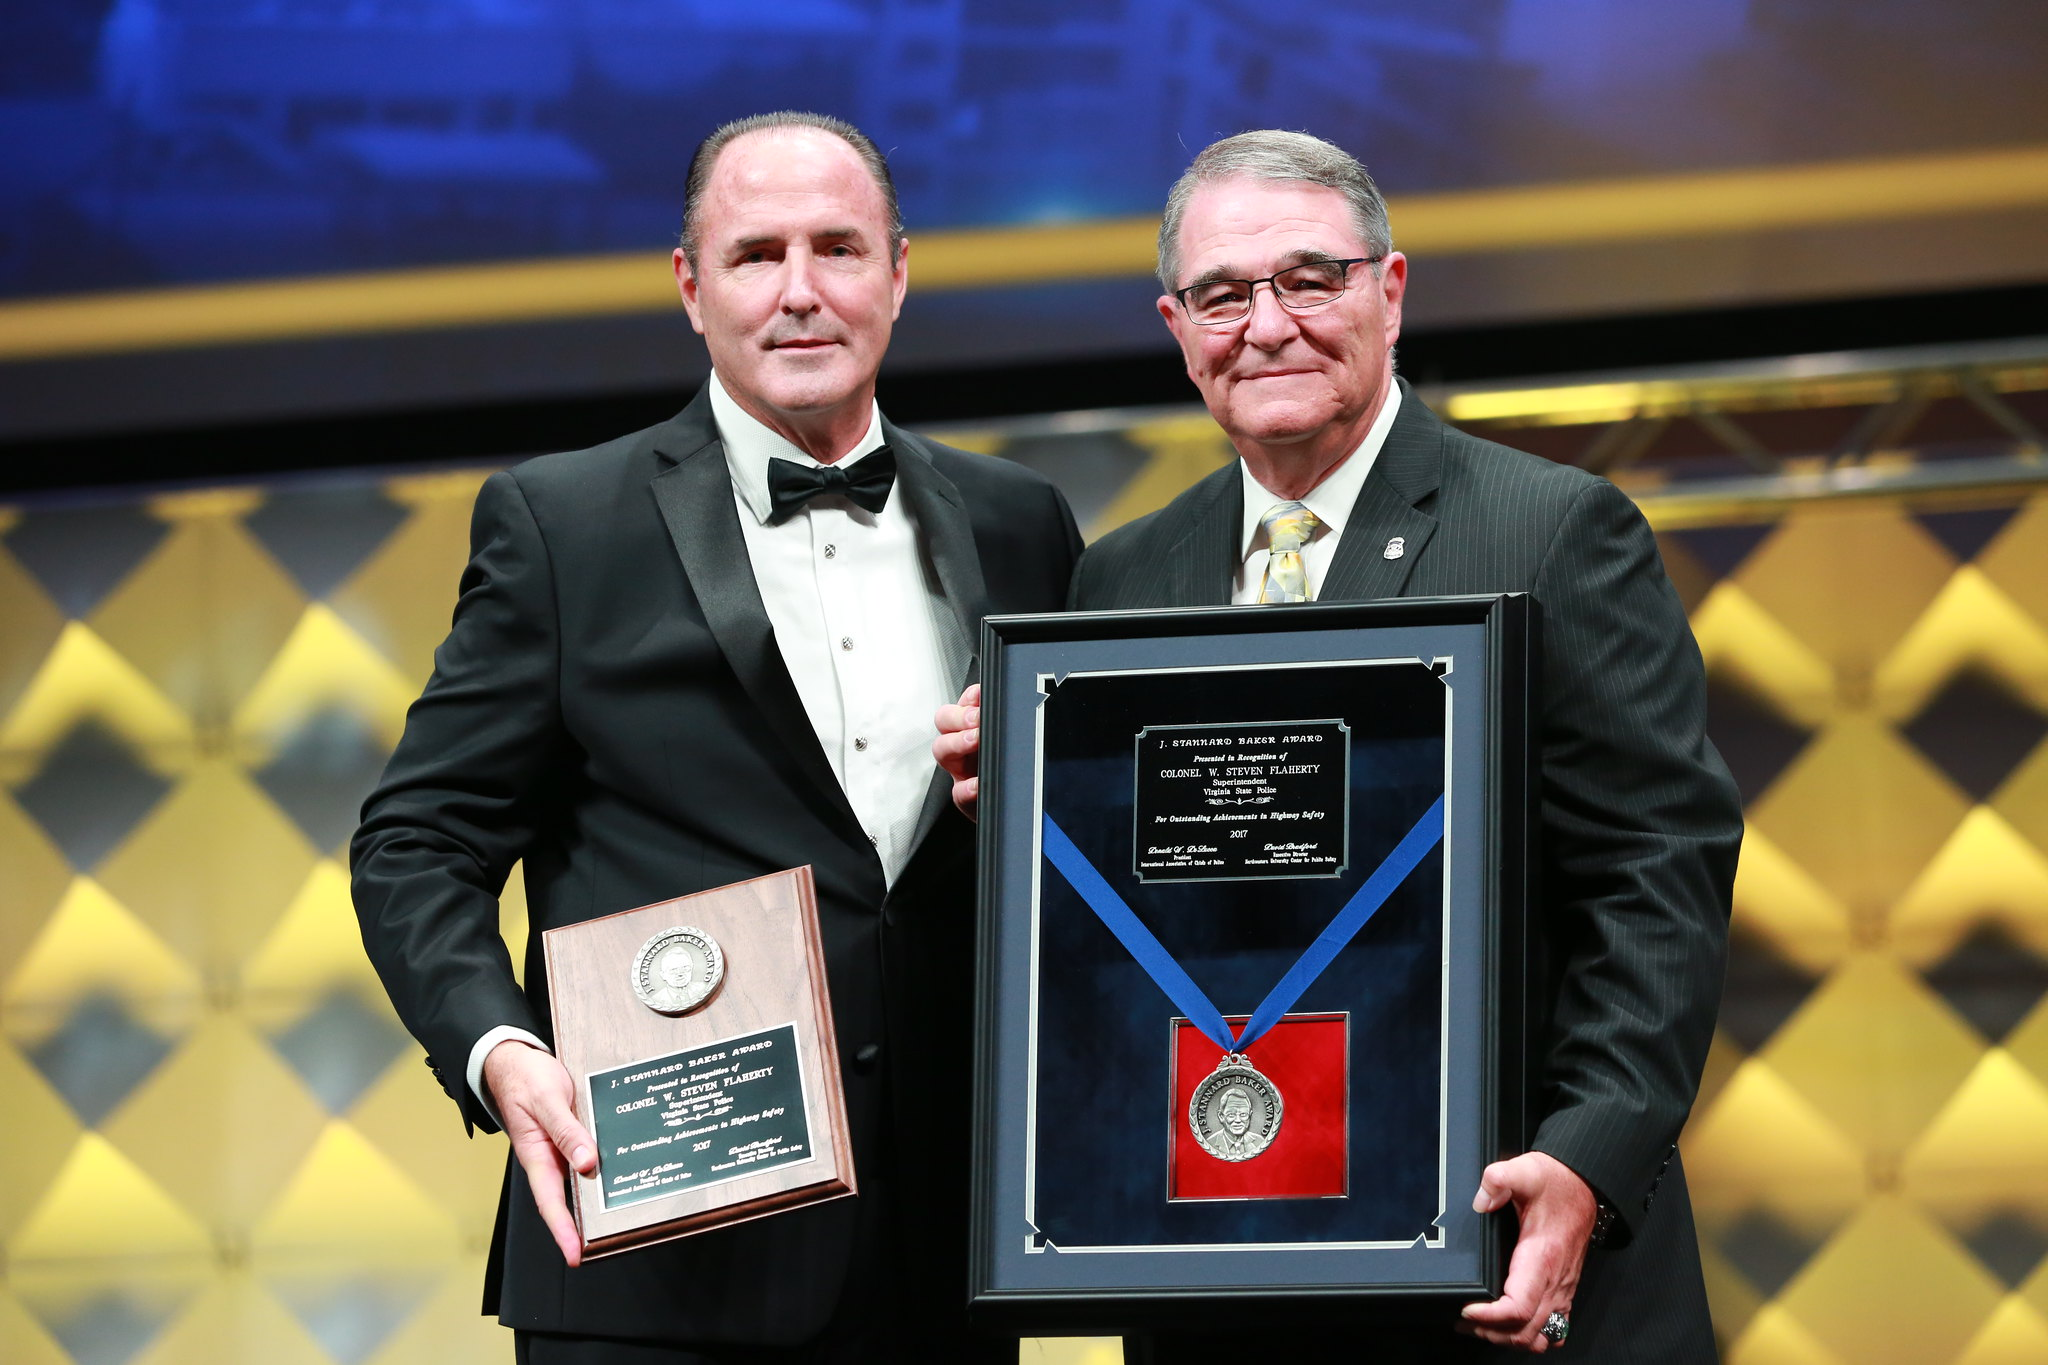 IACP J. Stannard Baker Leadership in Highway Safety Award - W. Steven Flaherty